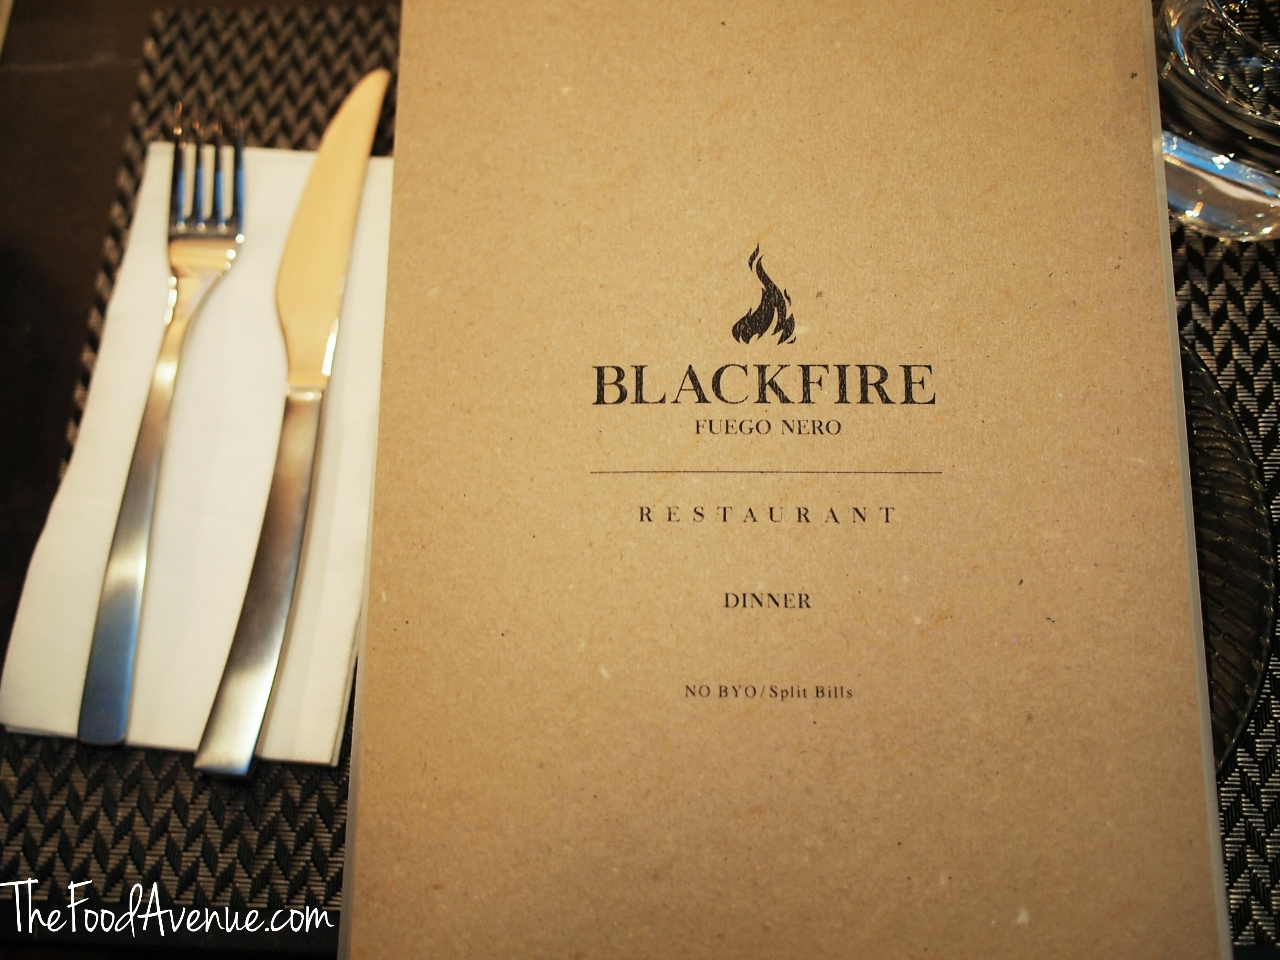 The_Food_Avenue_Black_Fire3